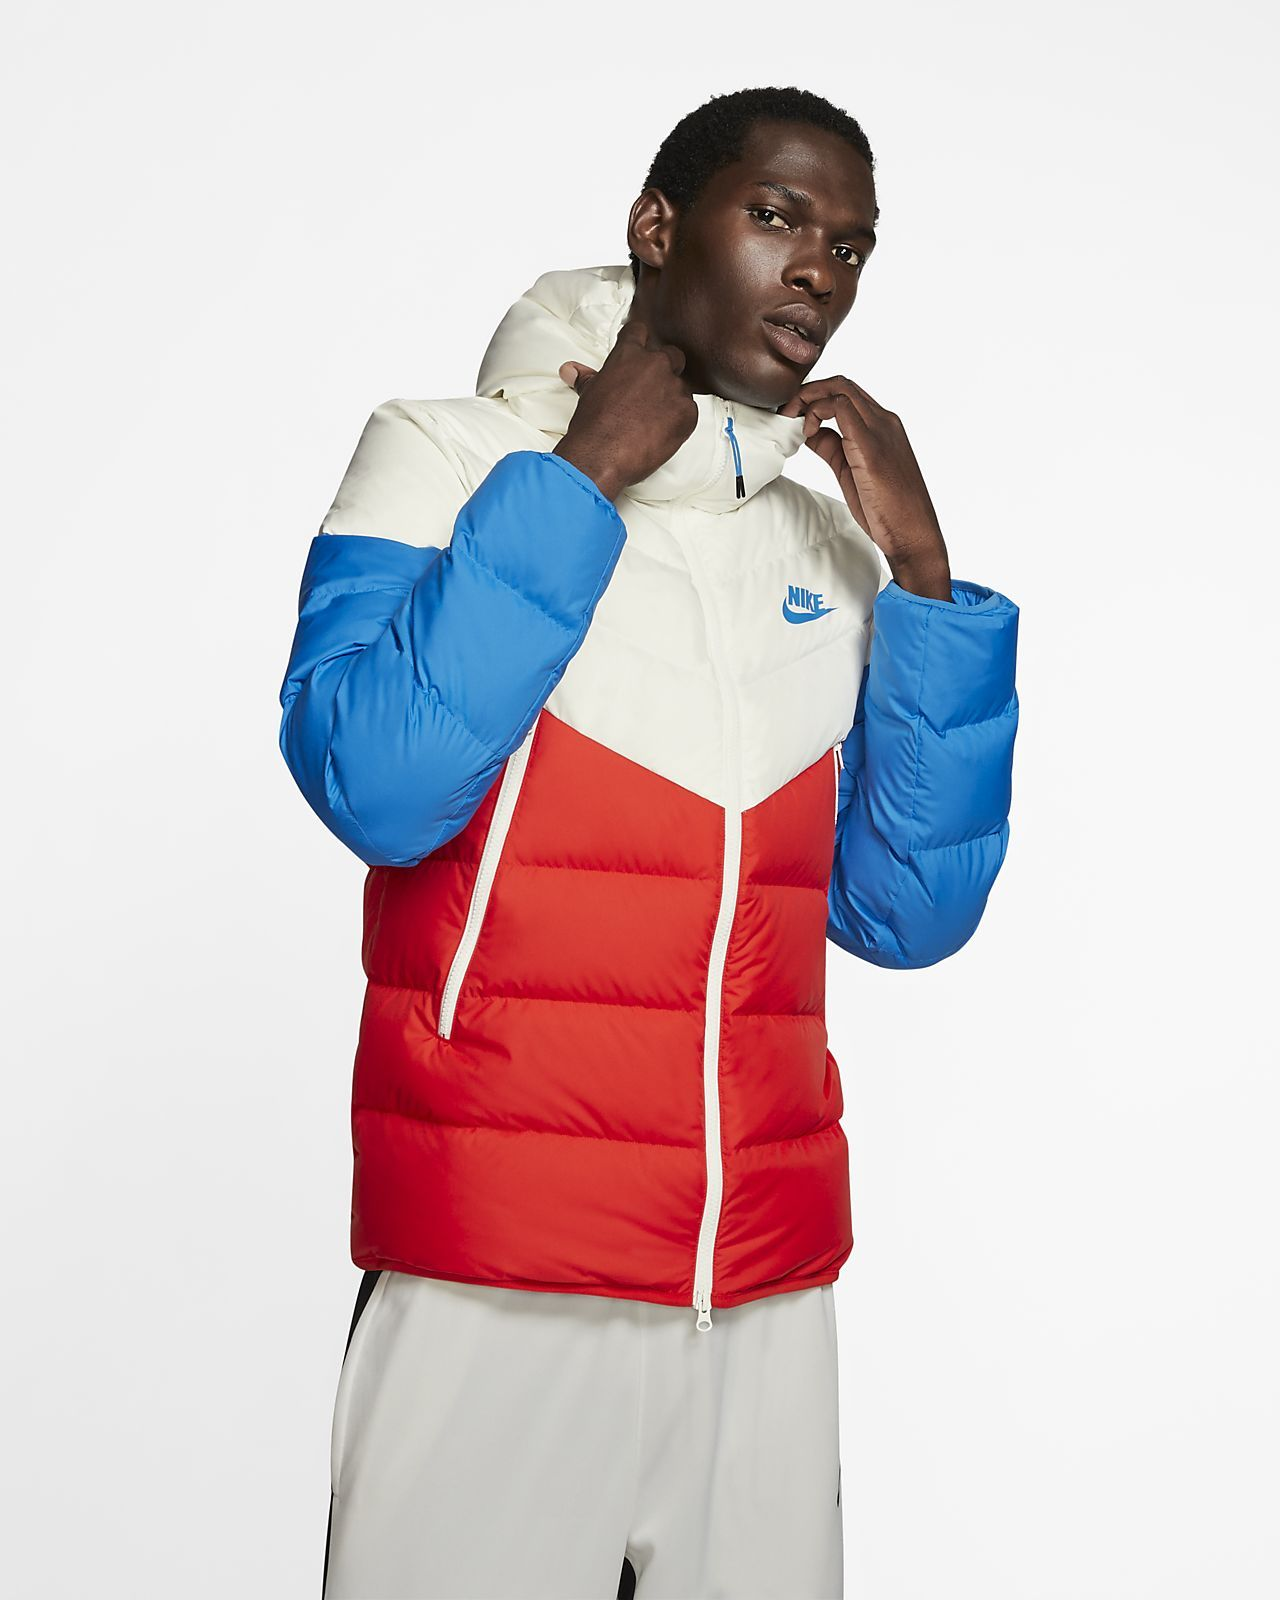 Hooded jacket men, Nike clothes mens